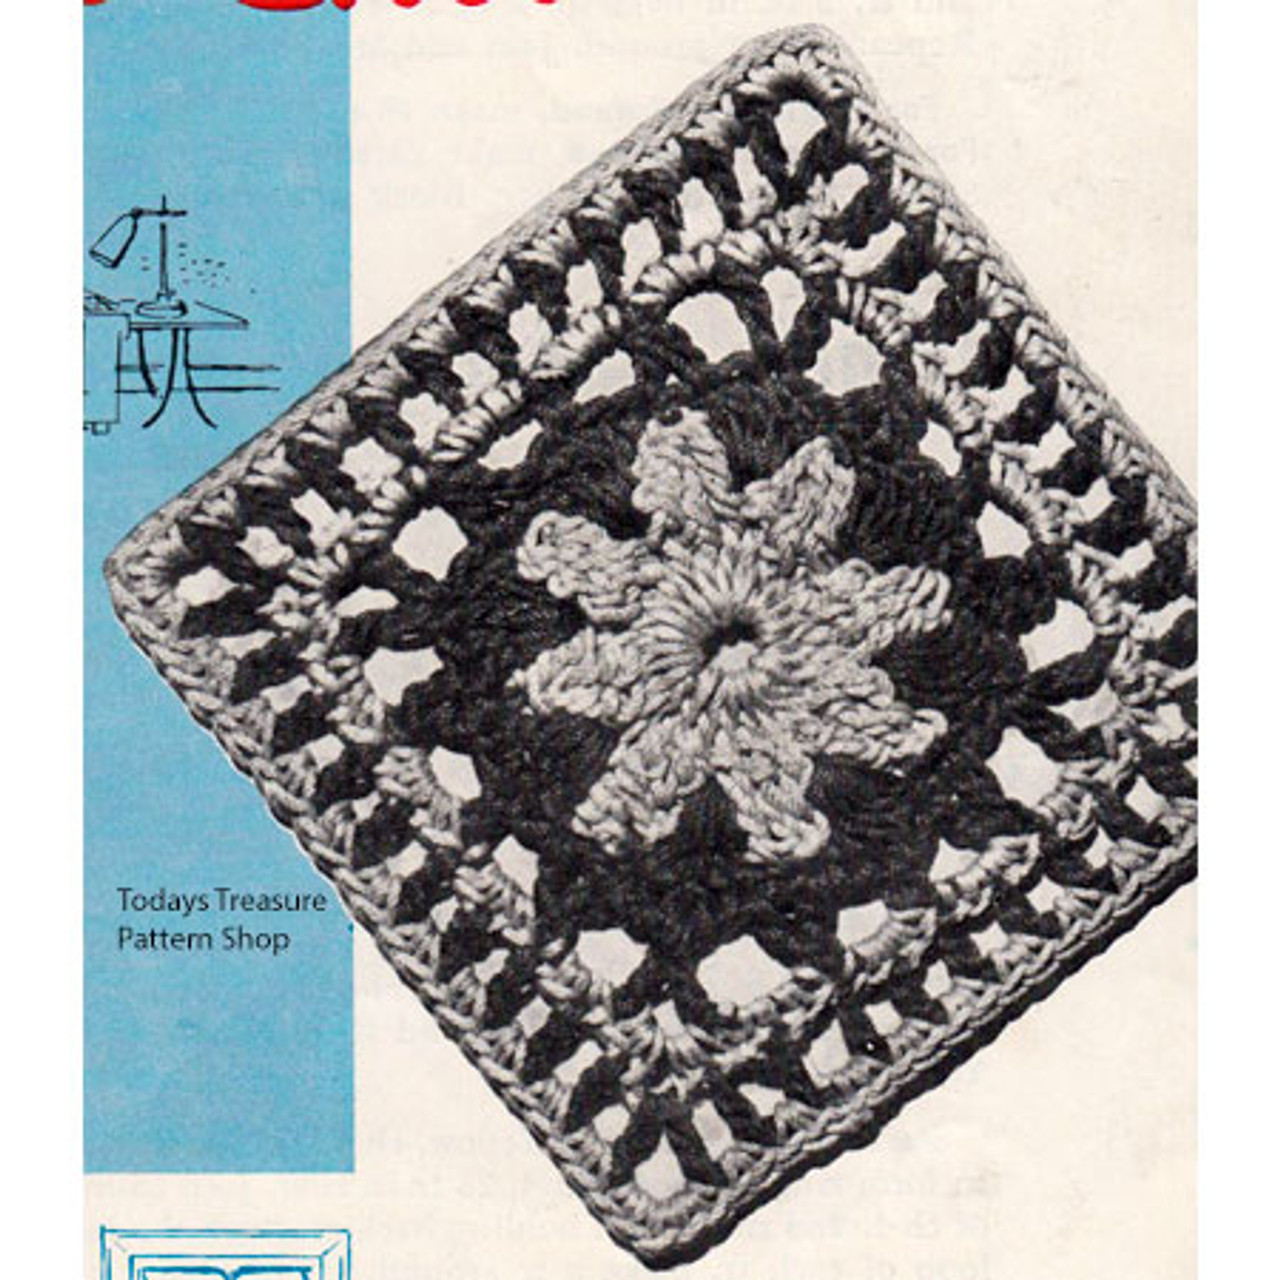 Illinois Modern Vintage Crochet Square Pattern